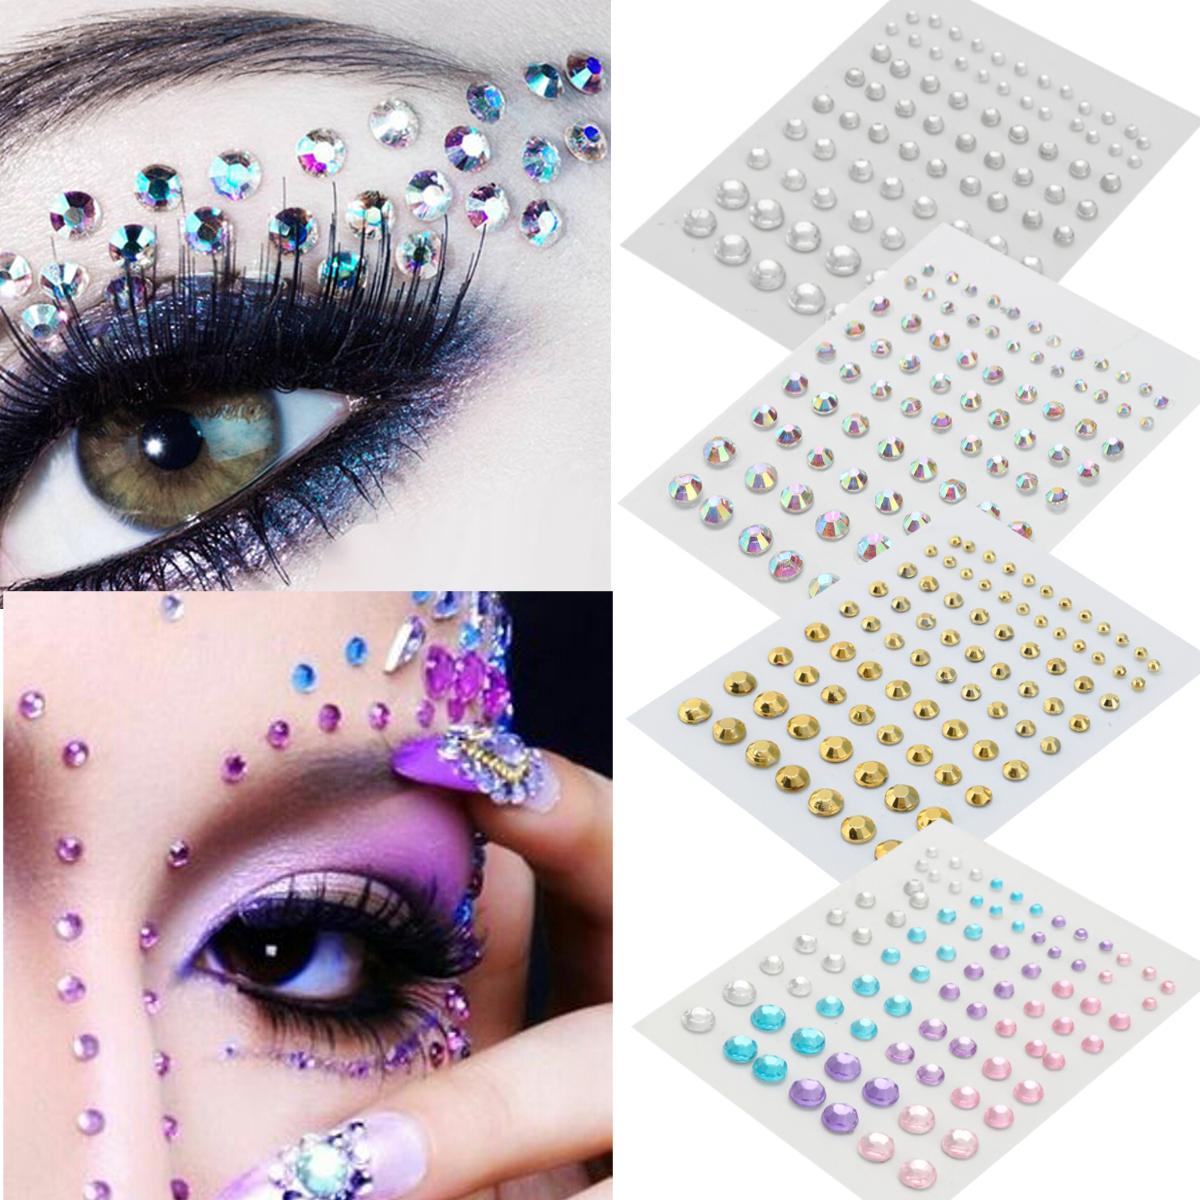 Halloween Party Jewelry Eyes Makeup Crystal Eyes Sticker Tattoo Diamond Glitter Makeup Sticker